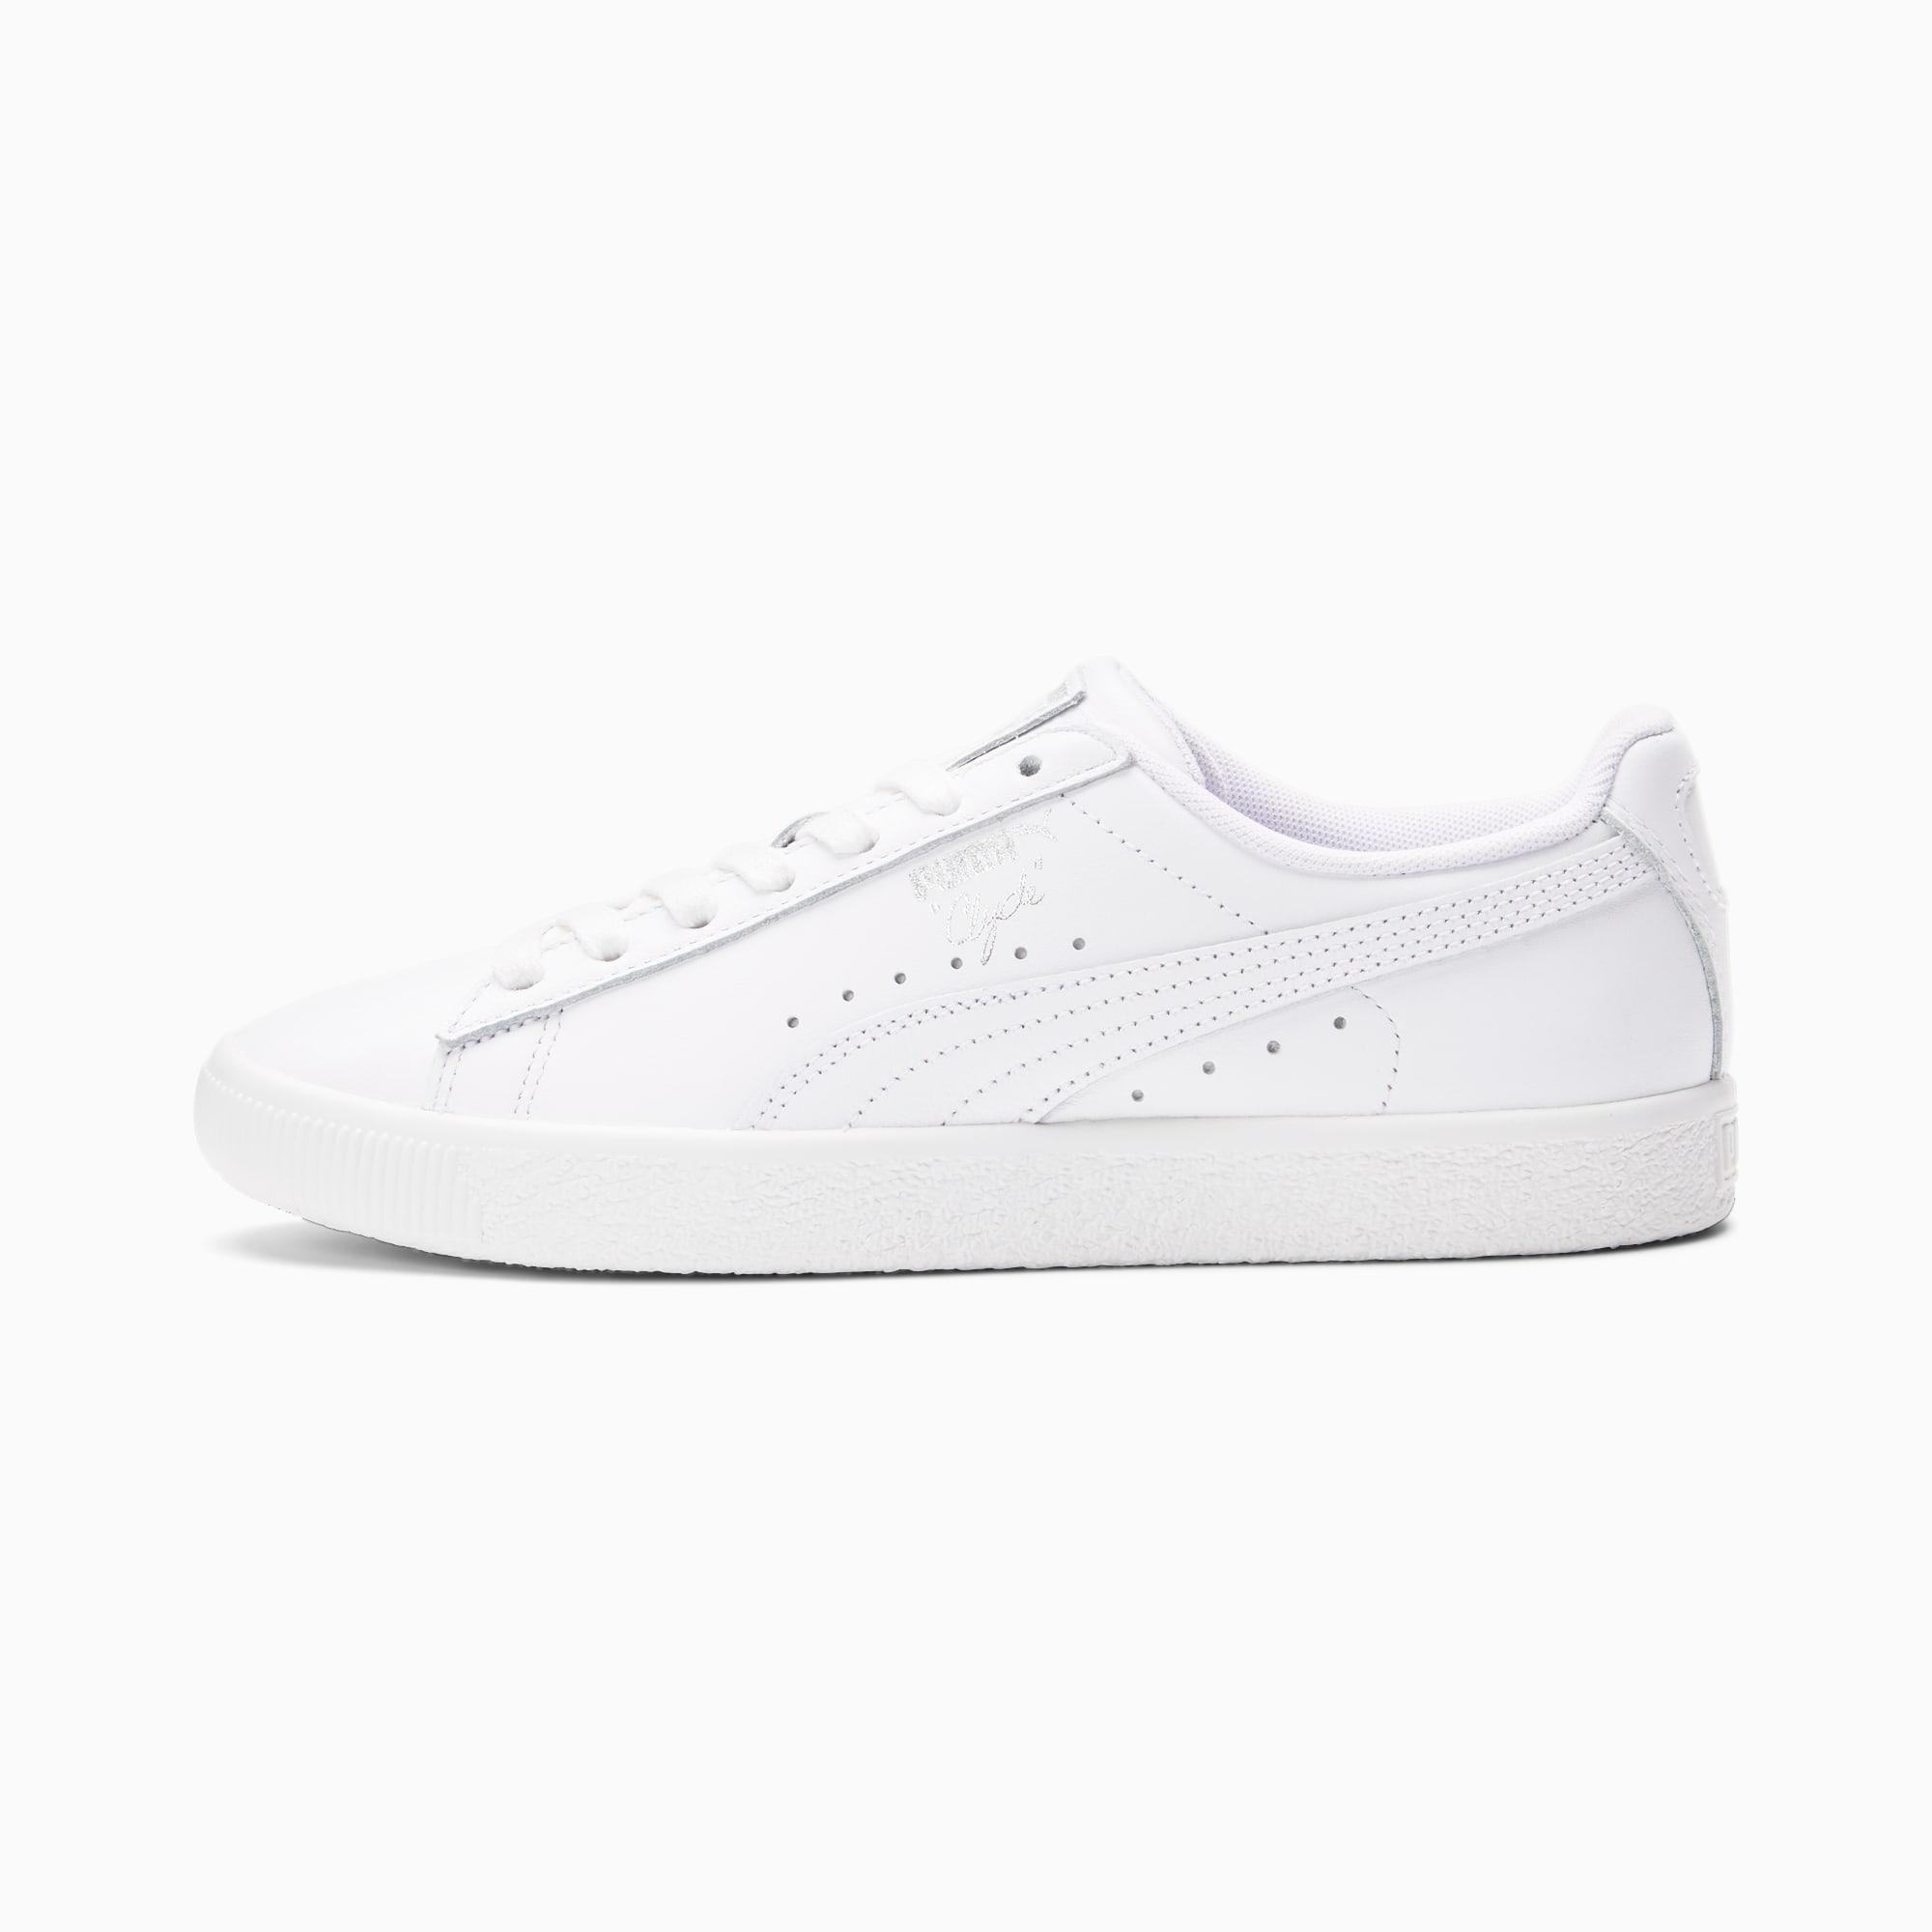 Clyde Core Foil Women's Sneakers